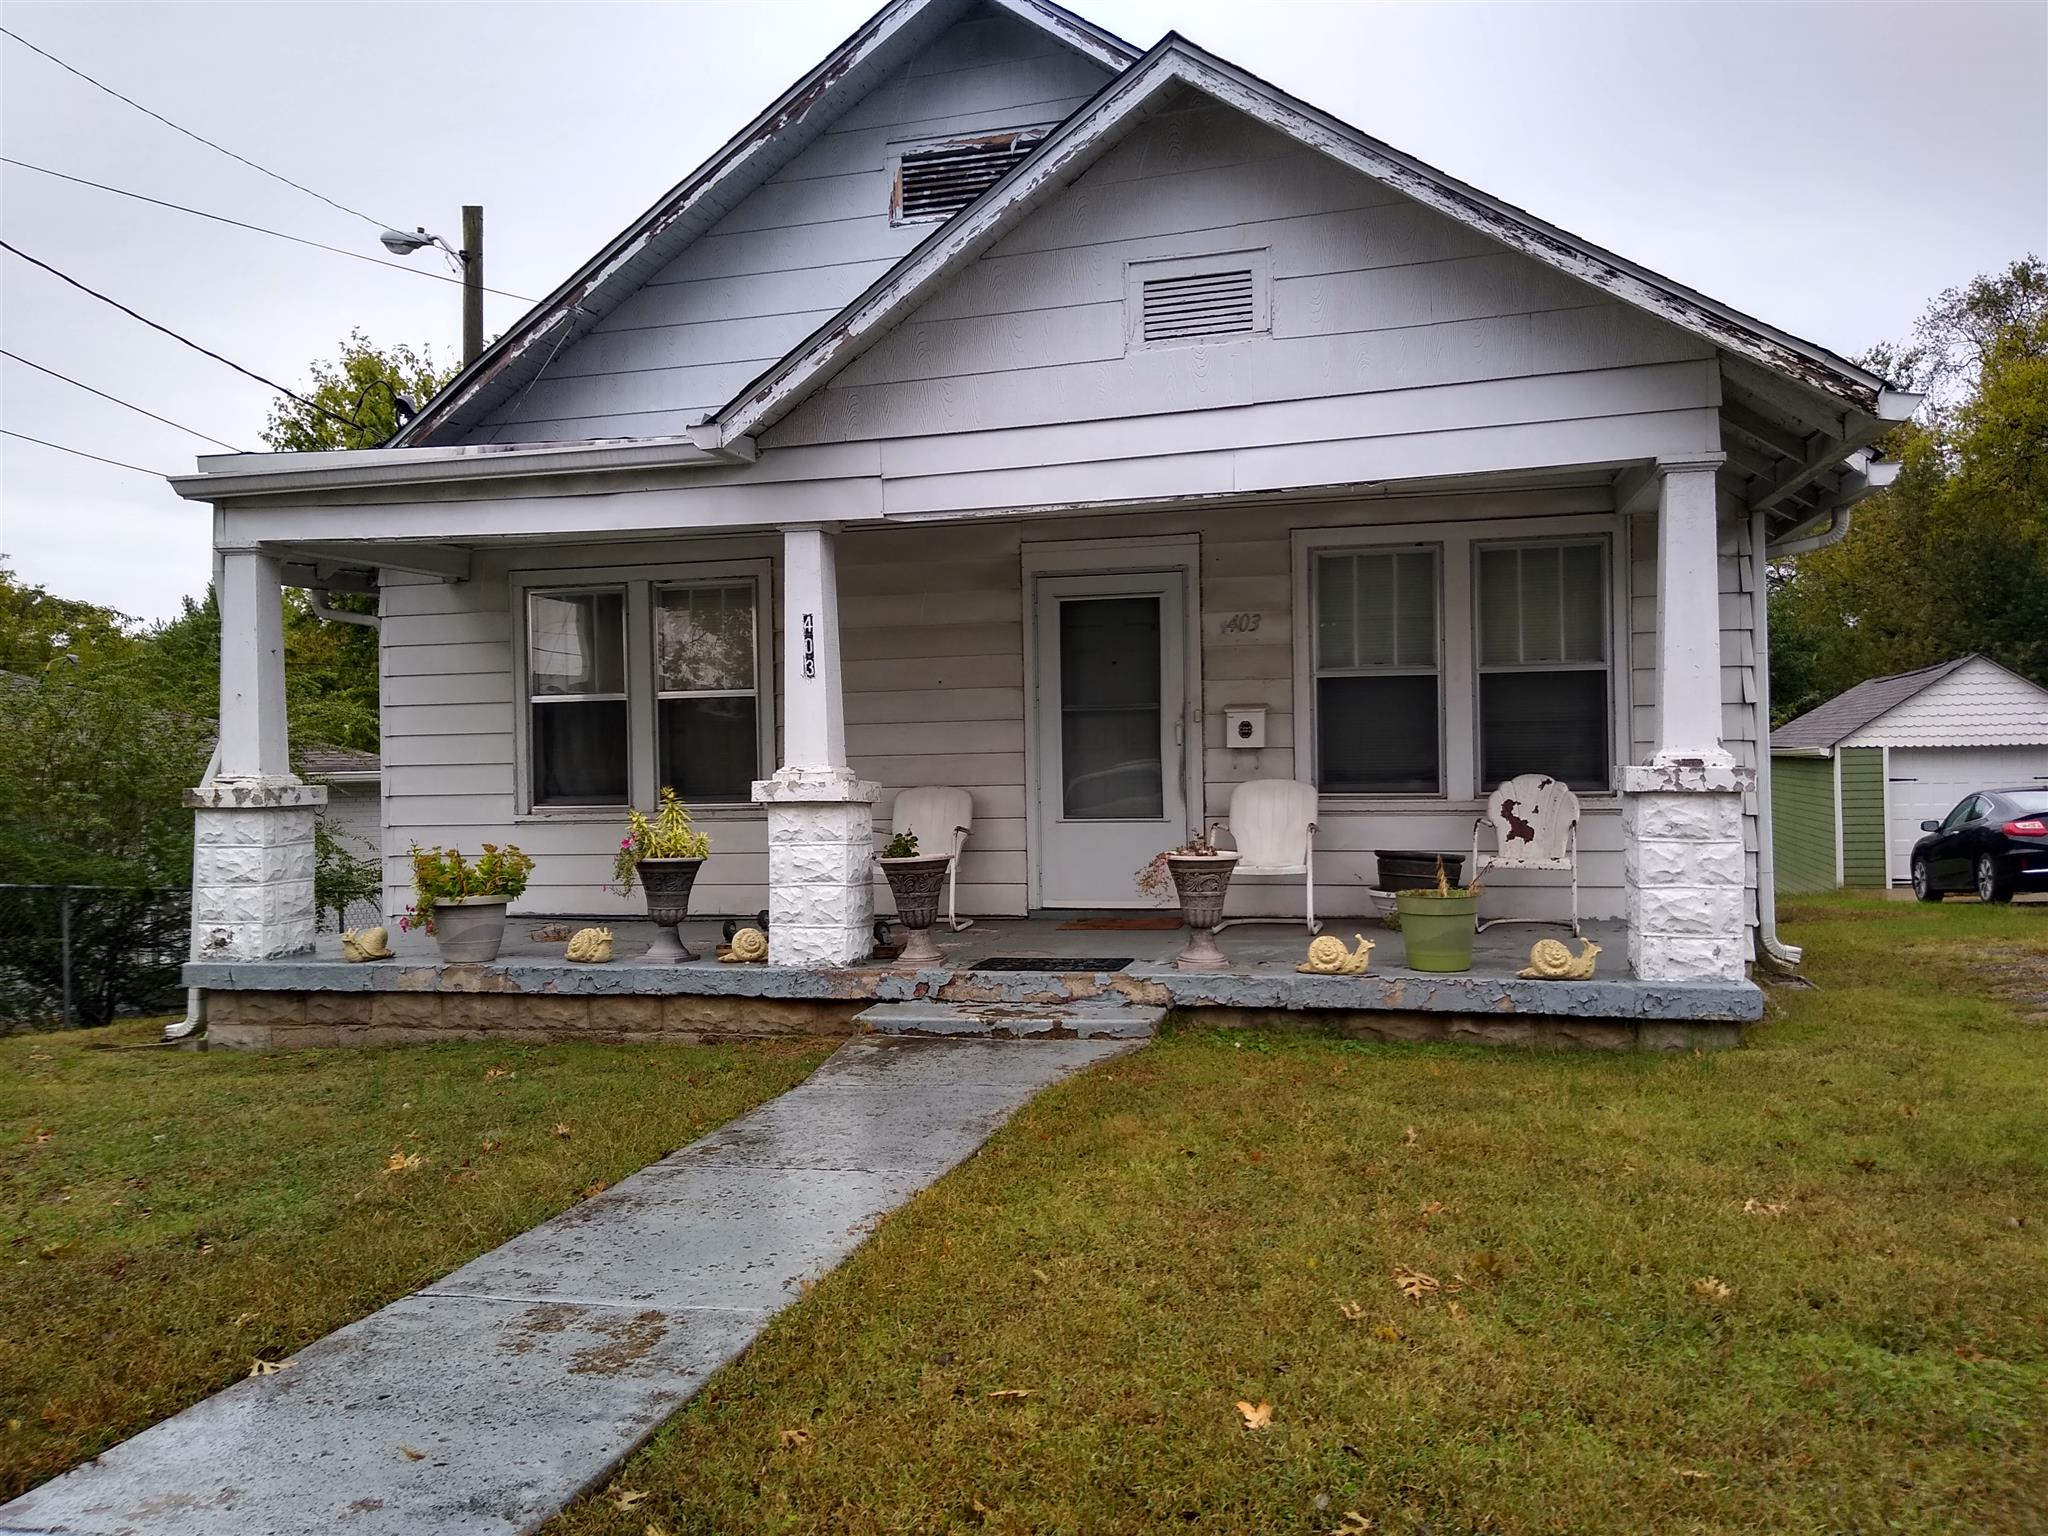 403 Neill Ave, Nashville, TN 37206 - Nashville, TN real estate listing